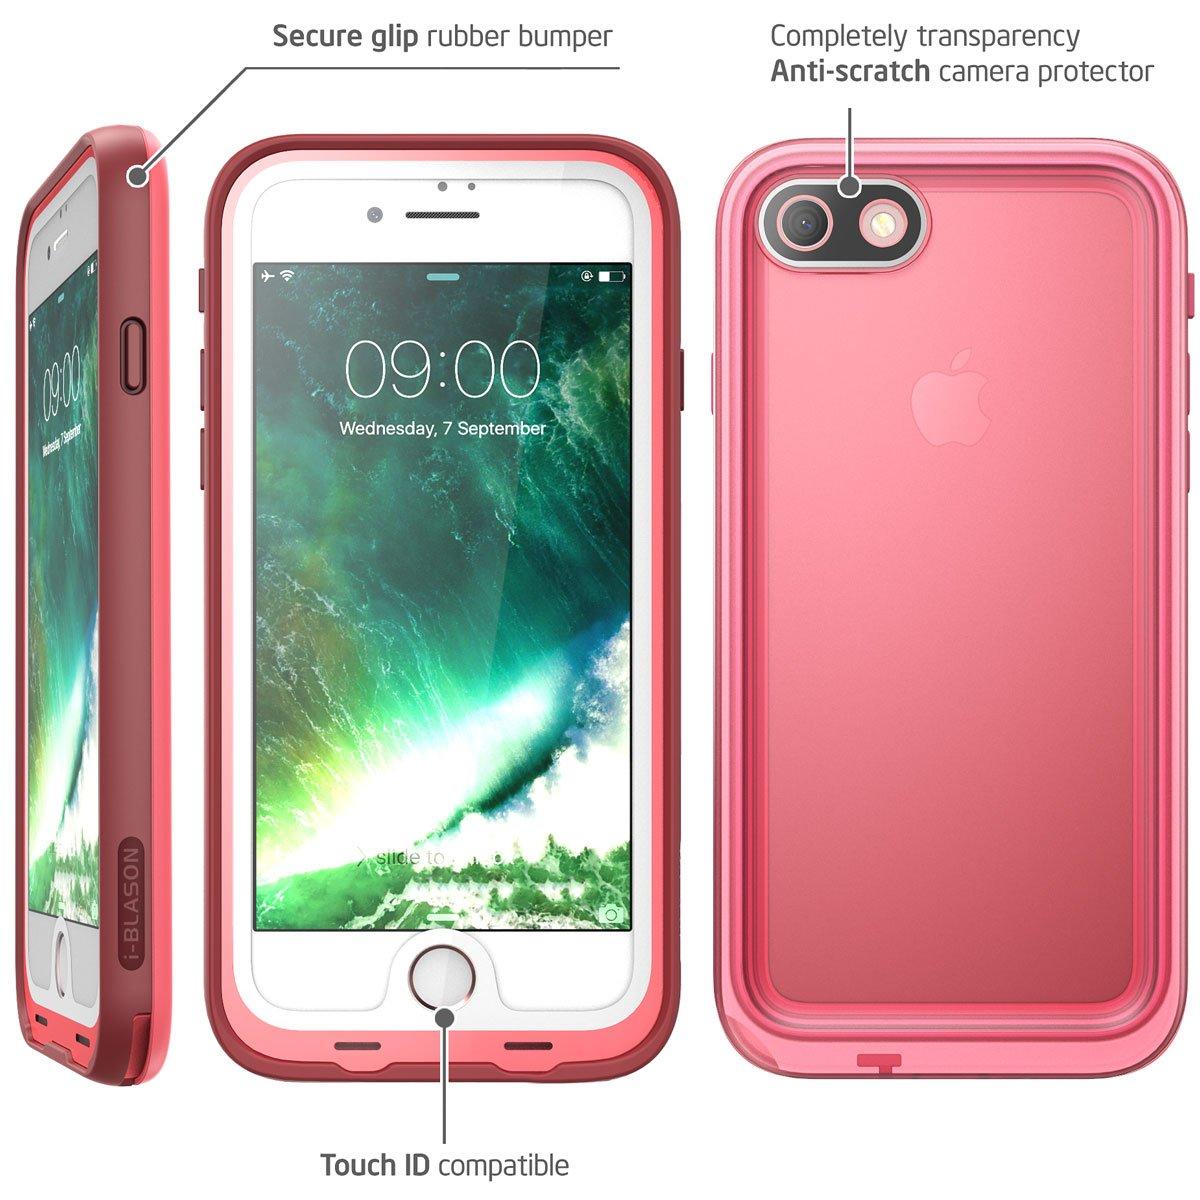 44a18e5117ed3 iPhone 8 Case, i-Blason [Aegis] Waterproof Full-body Rugged Case ...